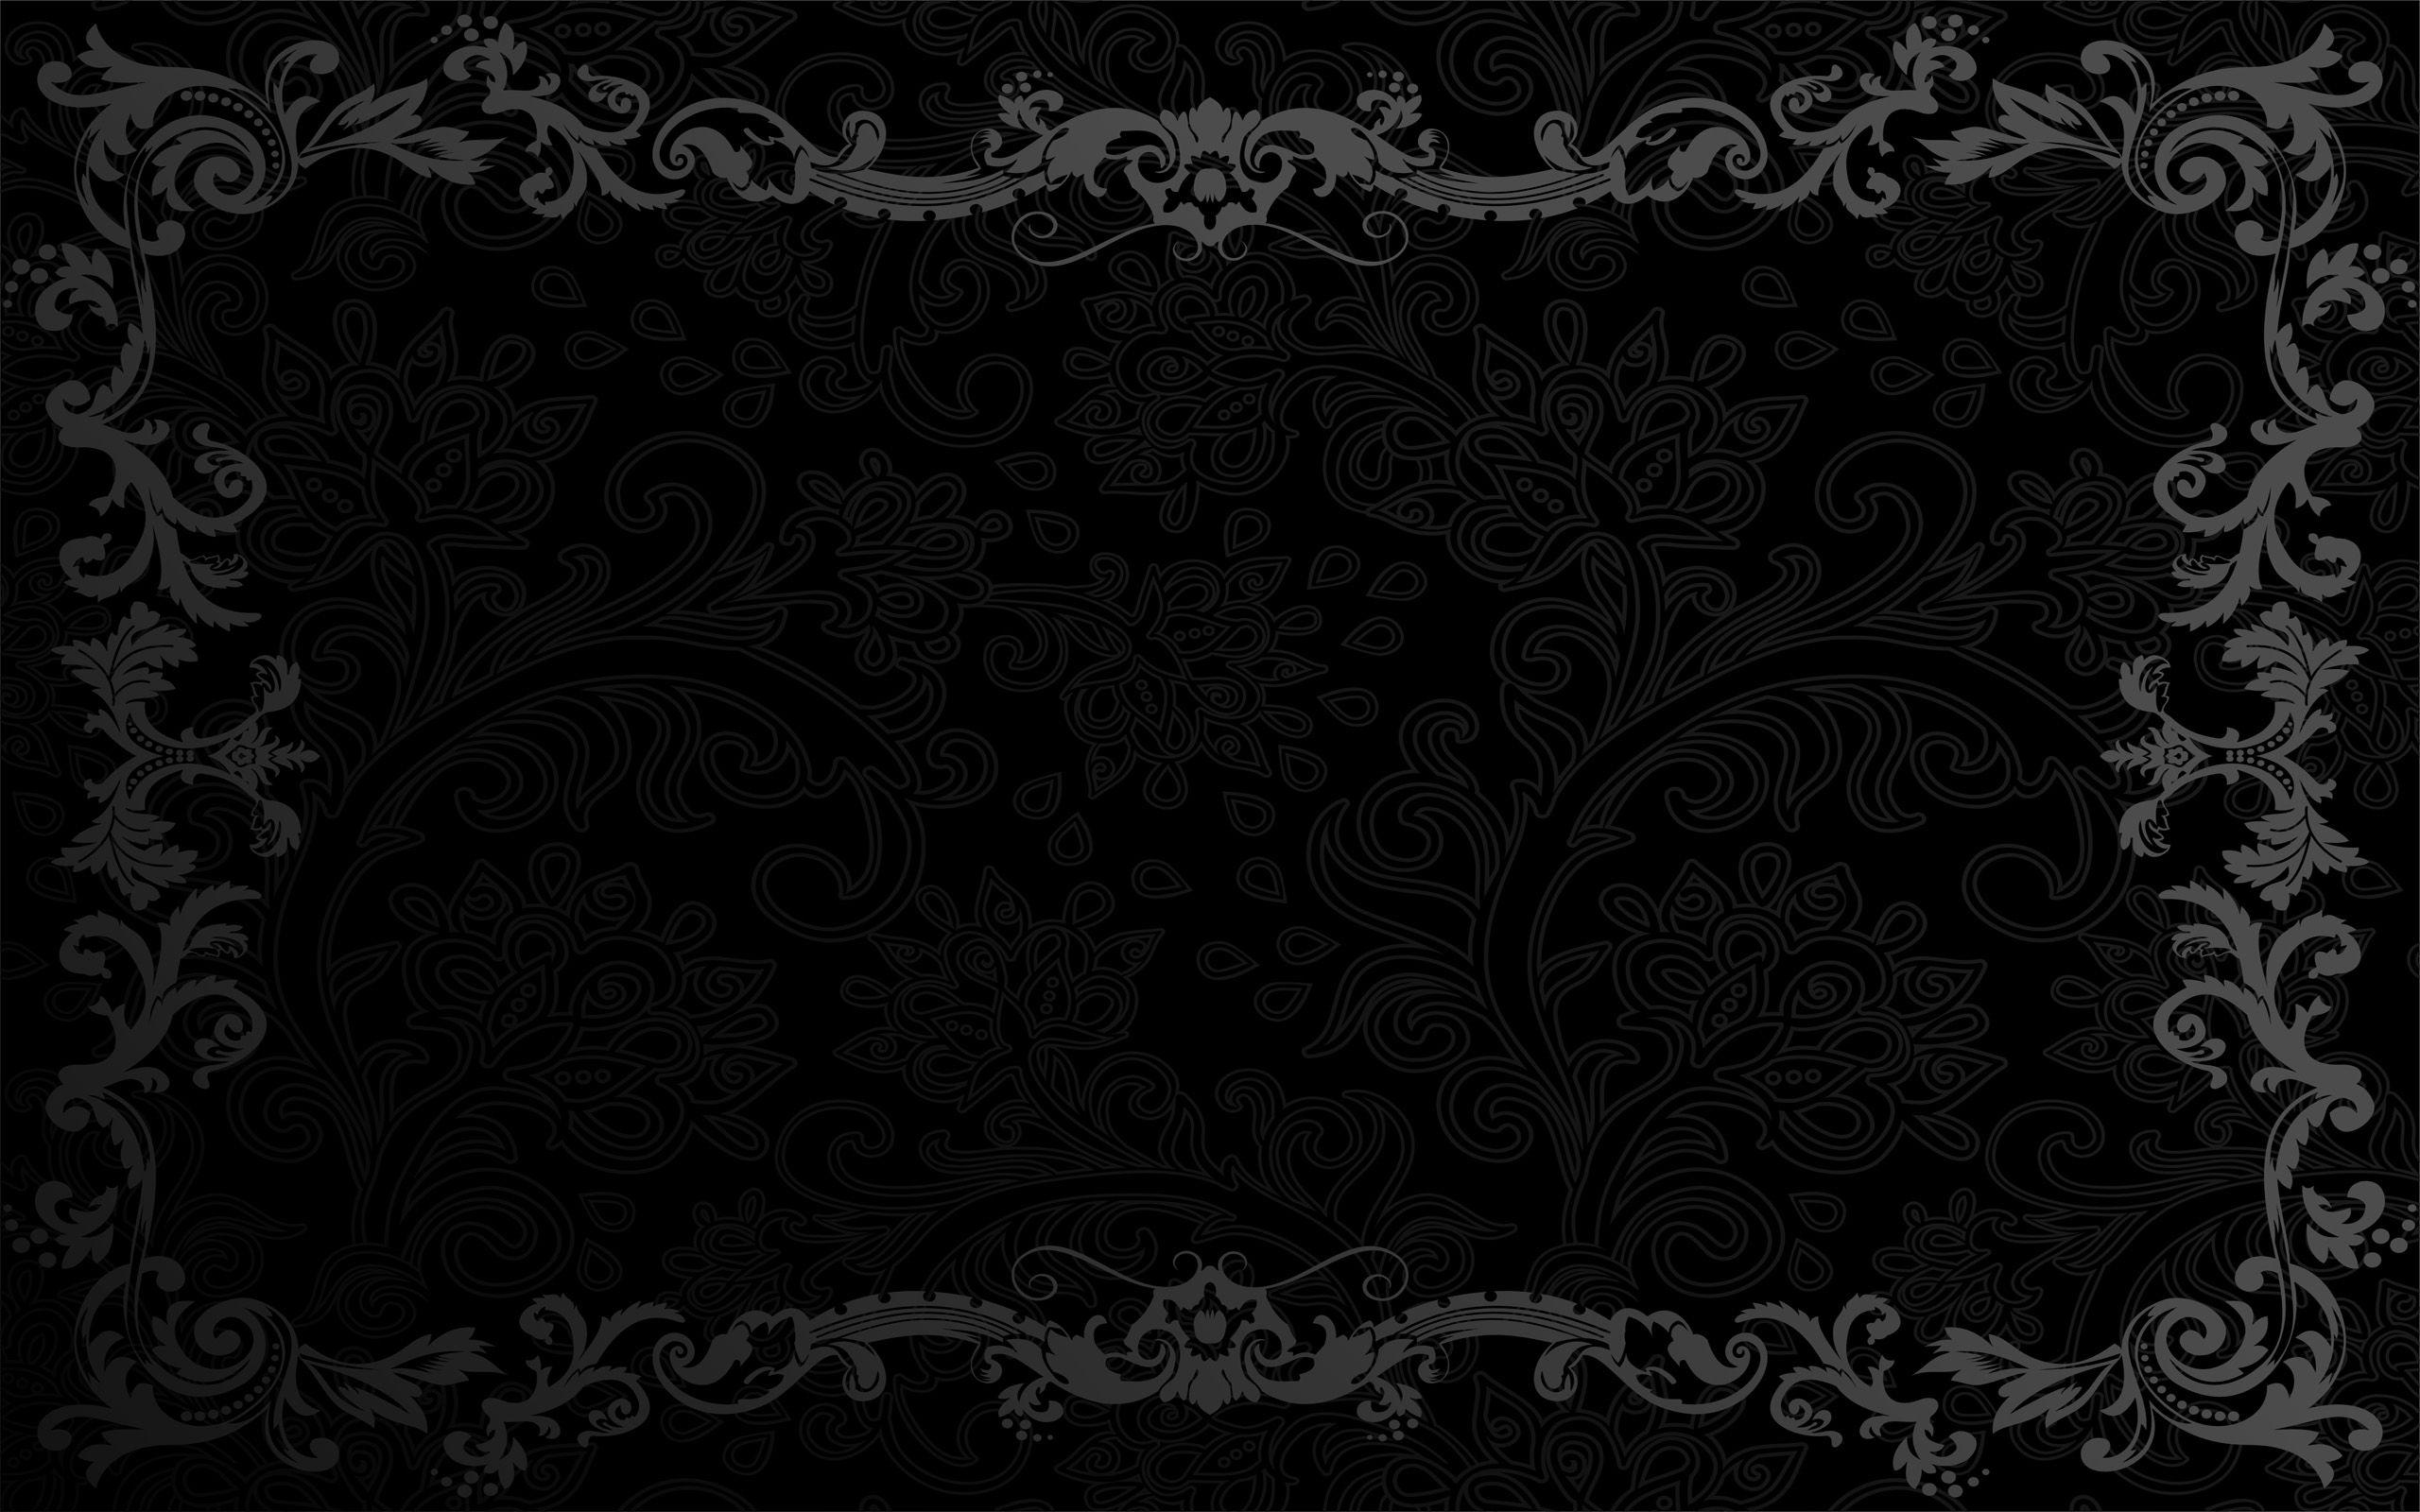 Black Background Free Large Images Black Hd Wallpaper Black Background Wallpaper Black Backgrounds